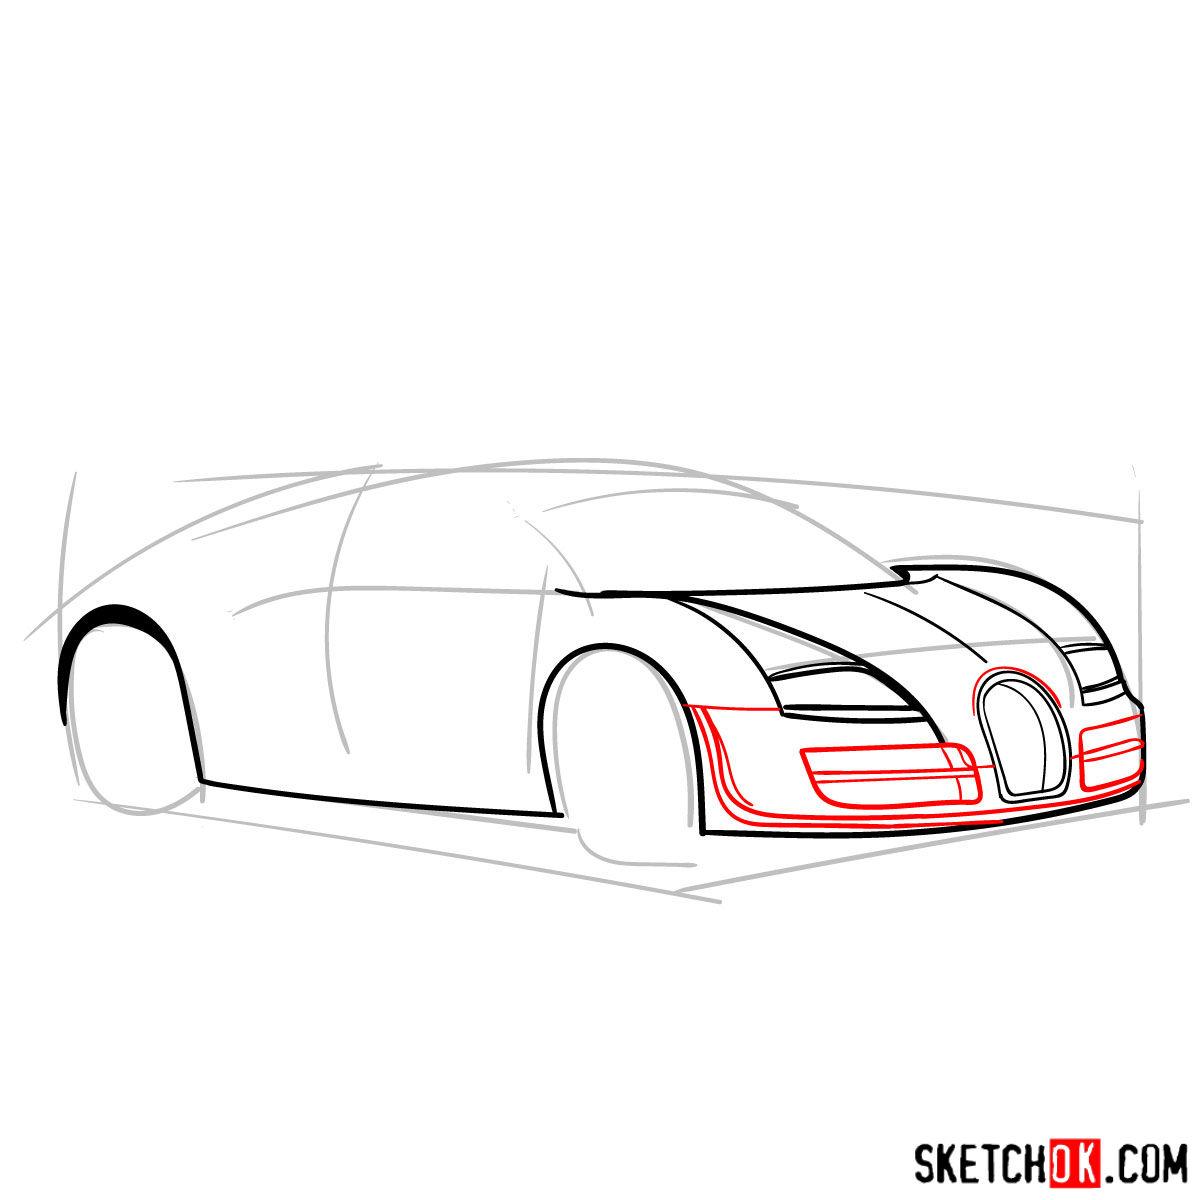 How to draw Bugatti Veyron 16.4 Super Sport - step 05